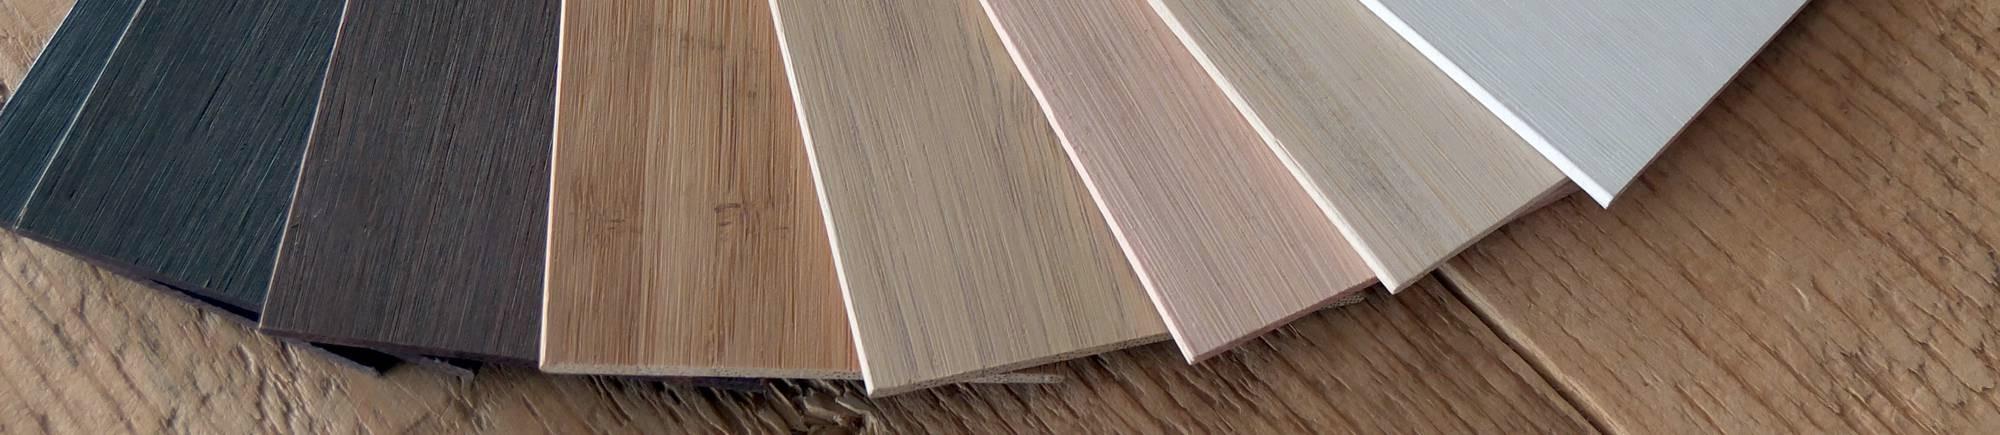 bamboe-jaloezien-interieur